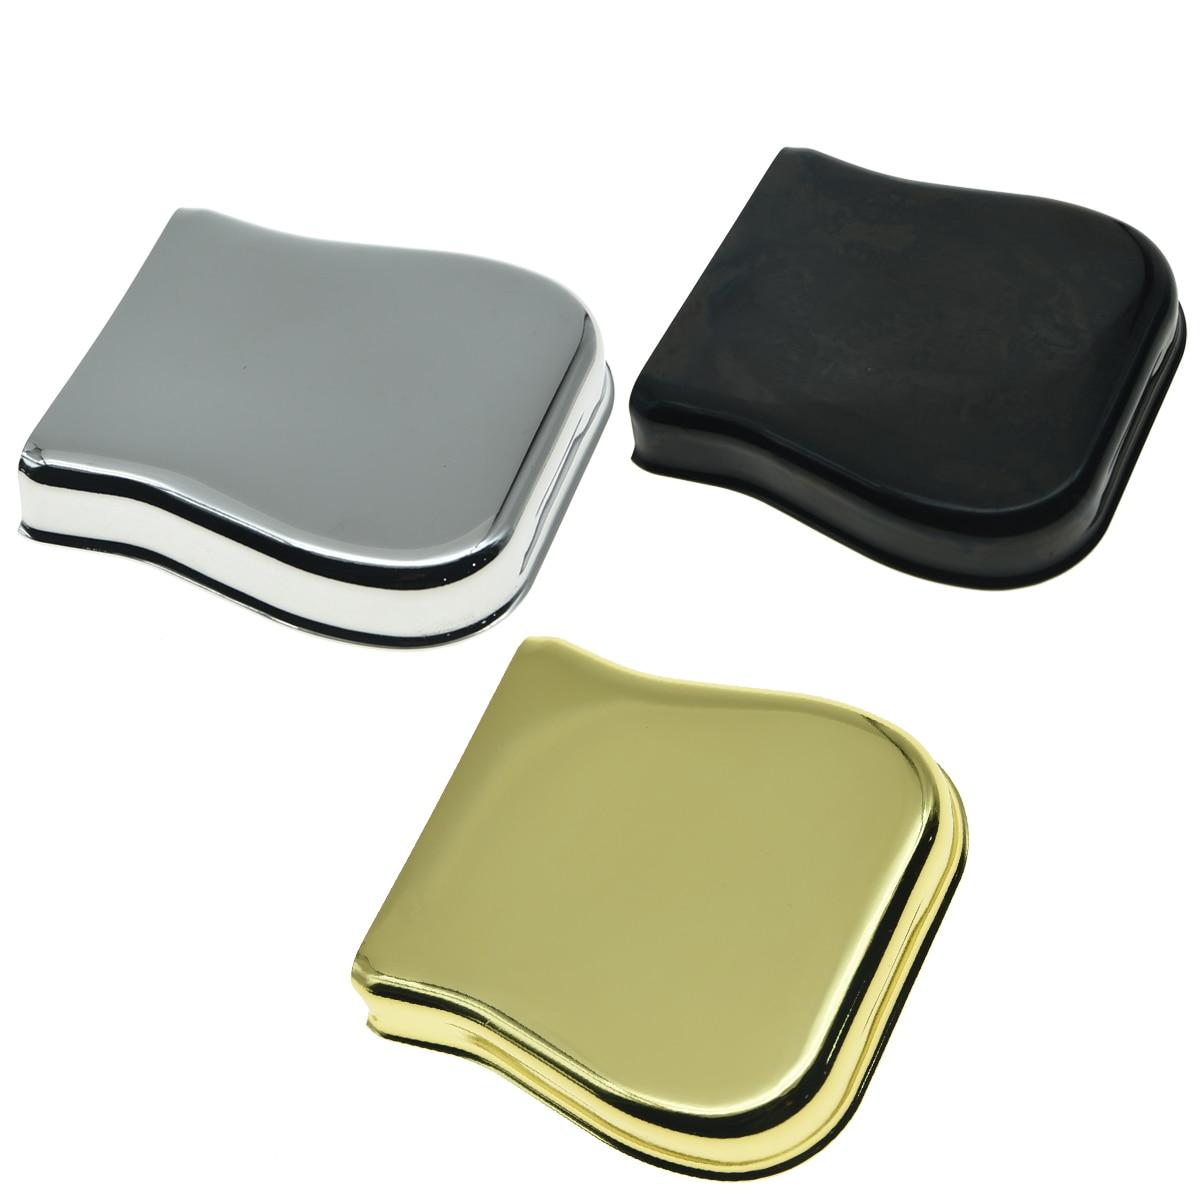 KAISH Vintage Tele Ashtray Bridge Cover for Fender or Wilkinson Bridge Chrome/Black/Gold ashtray dragon